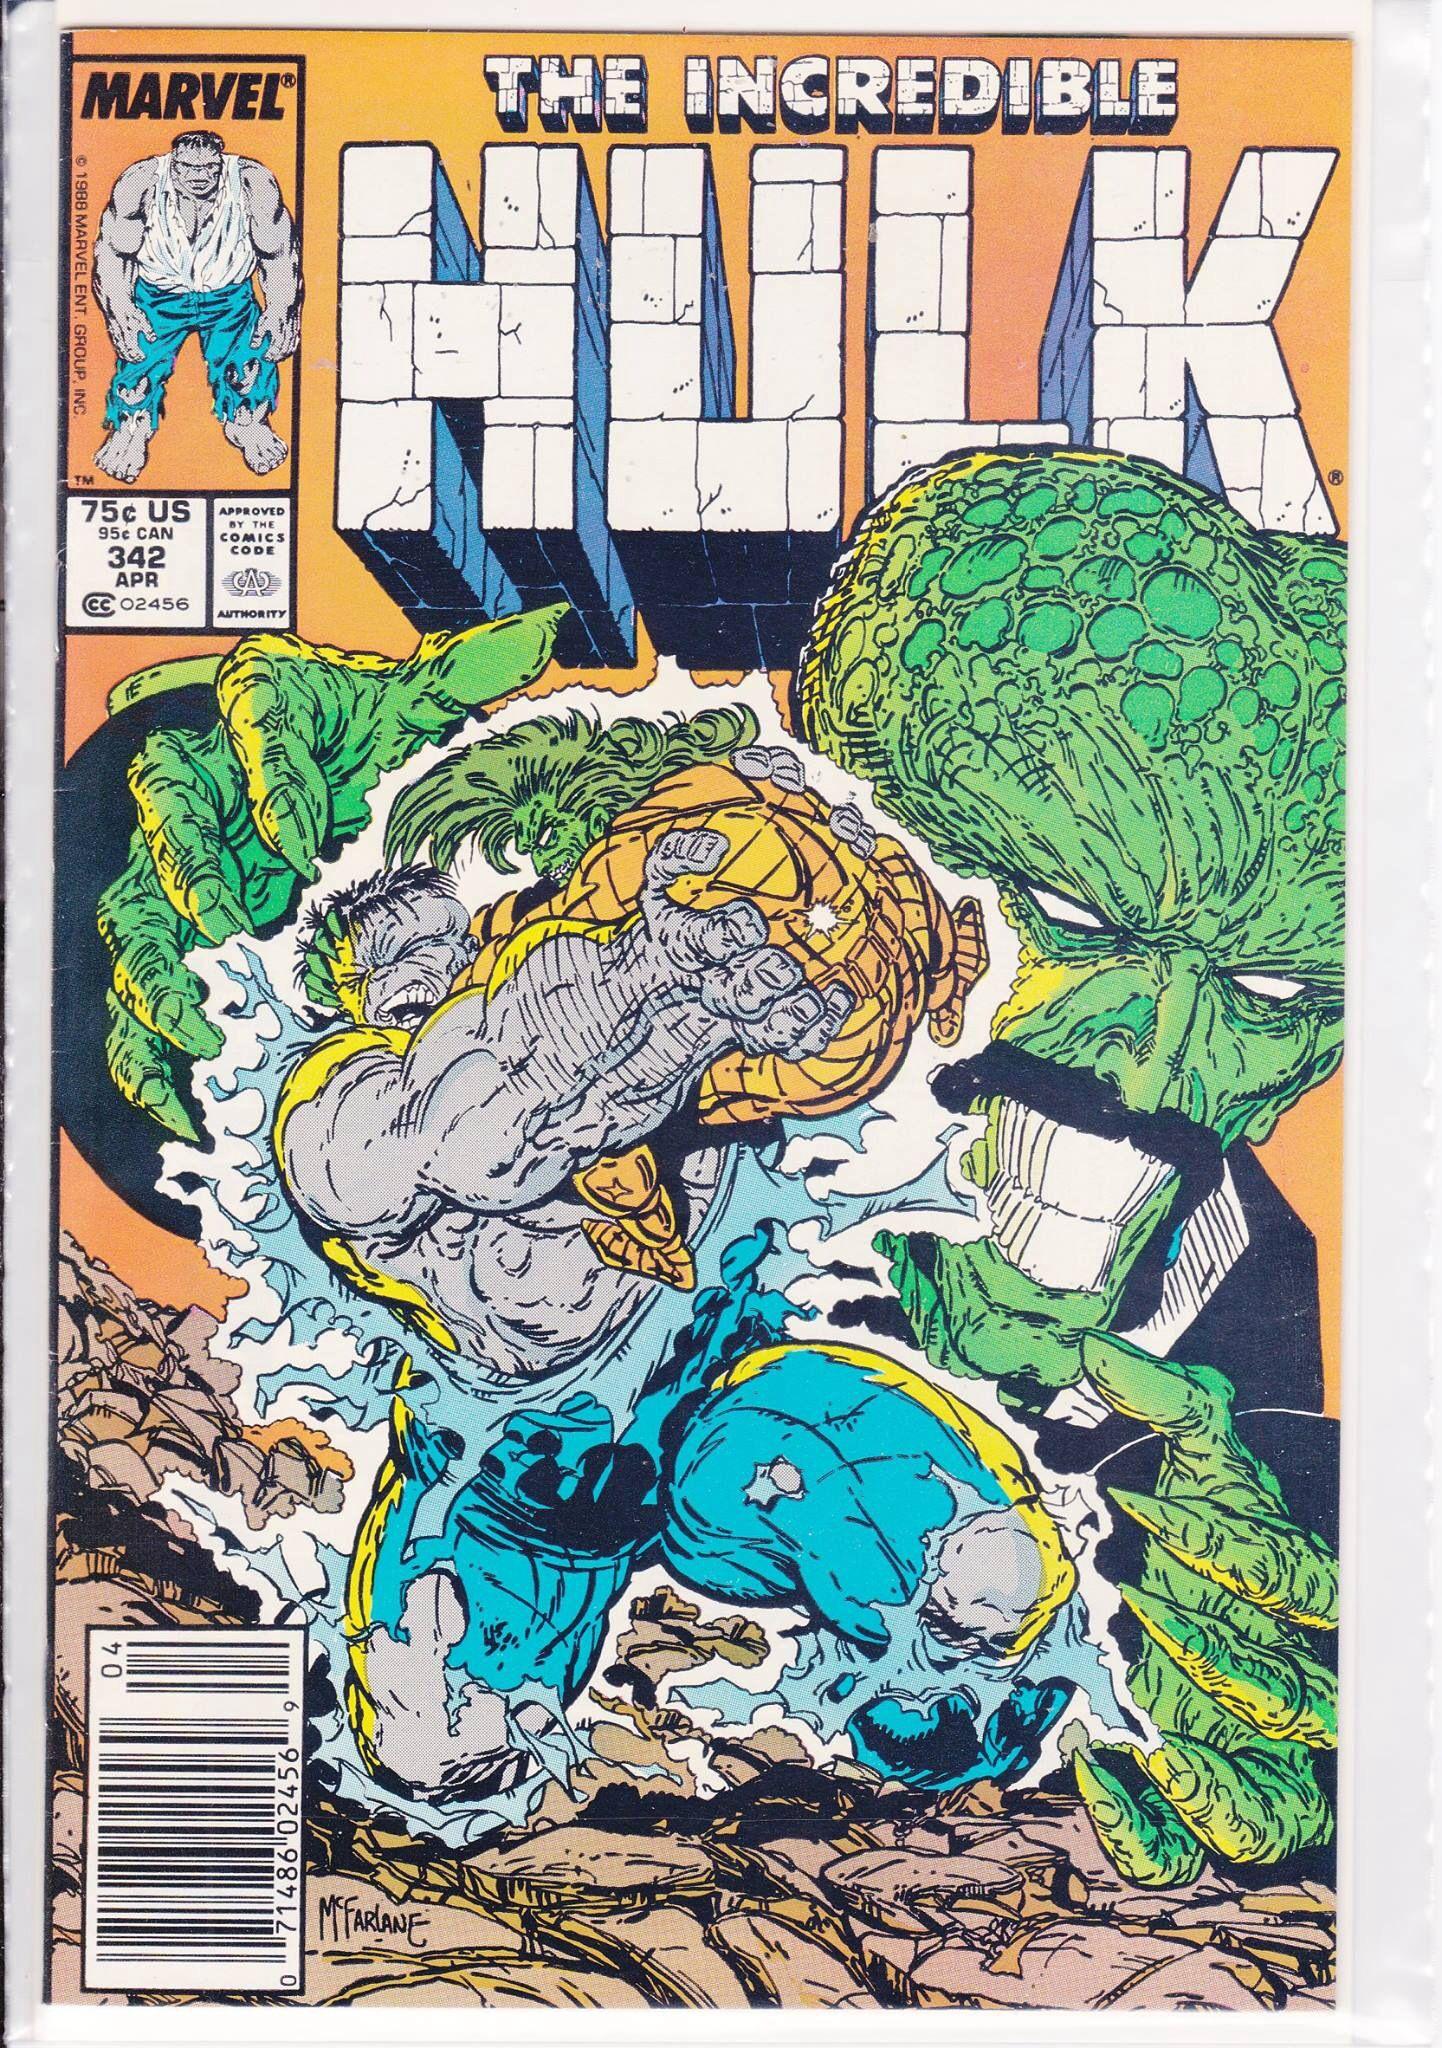 Todd mcfarlane hulk 342 cool comic book covers 2 pinterest todd mcfarlane hulk 342 fandeluxe Image collections